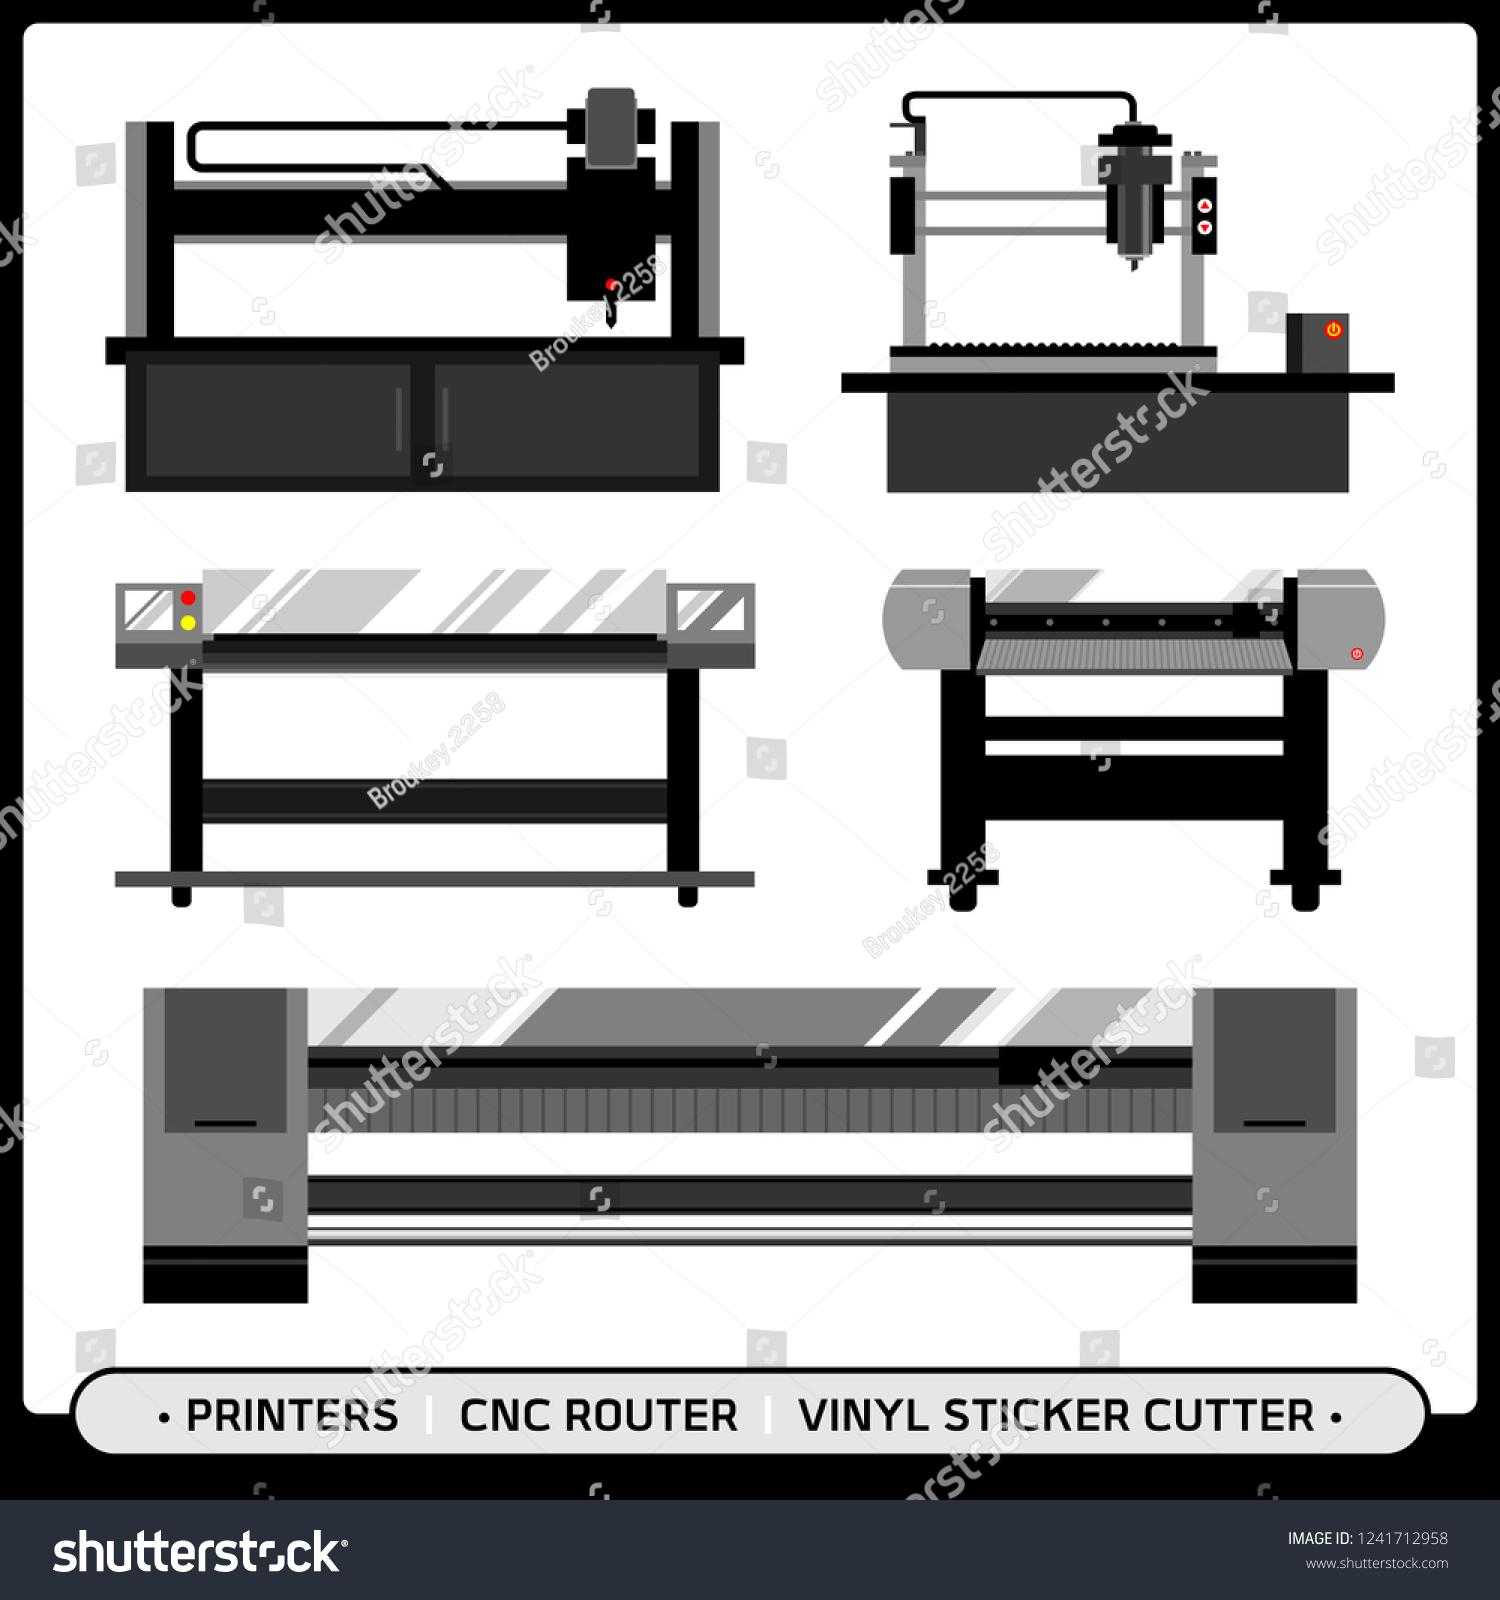 Signage Shop Machineries Cnc Router Mini Stock Vector